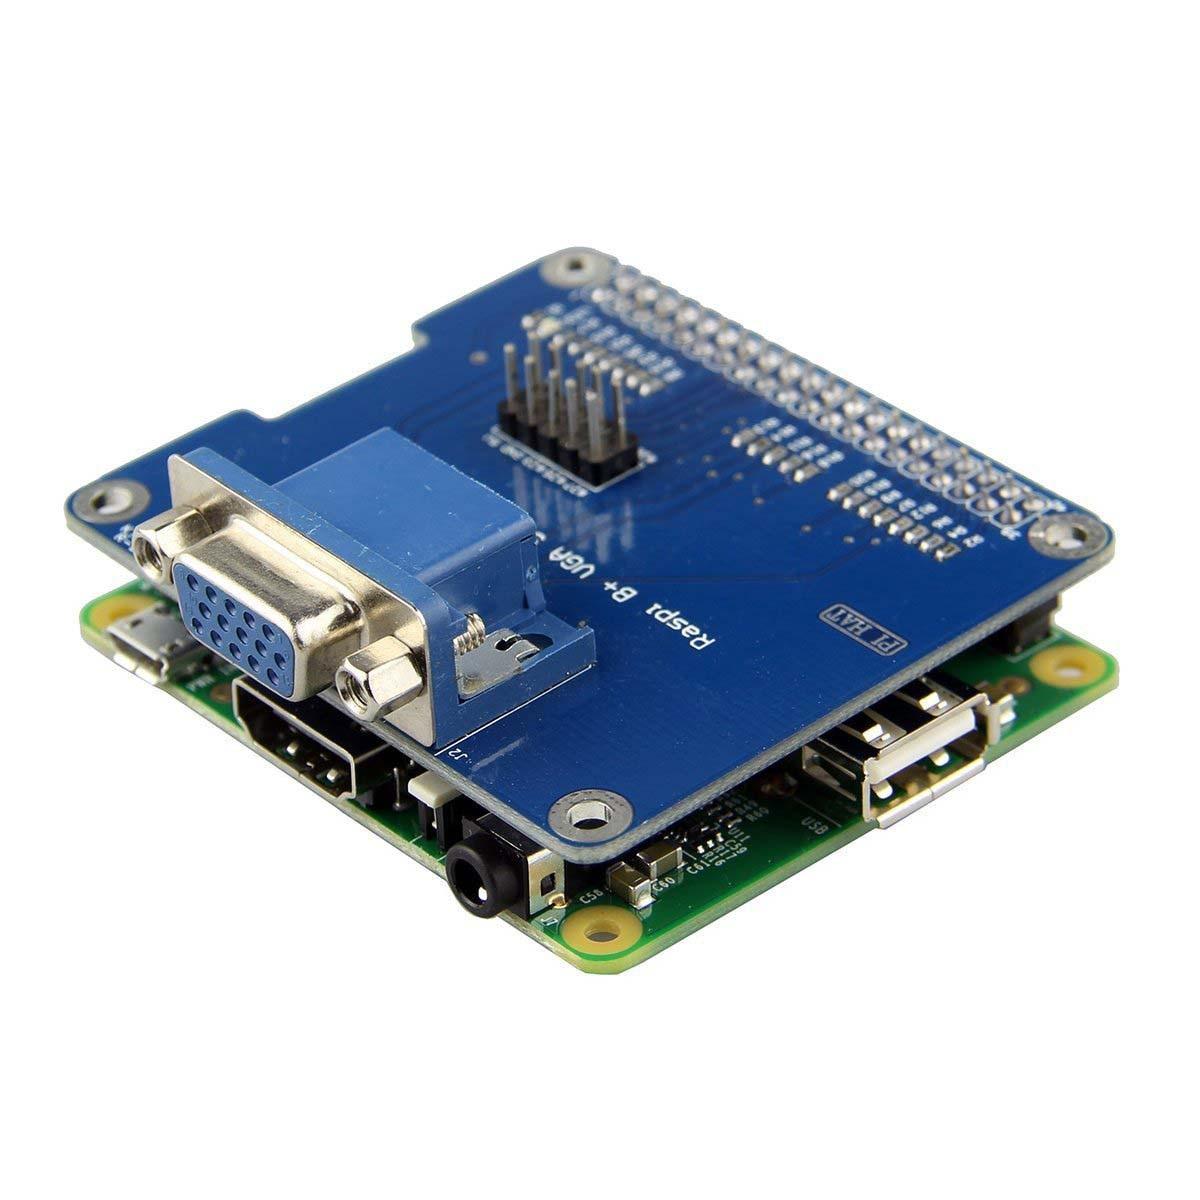 VGA Shield V2.0 Expansion Board For Raspberry Pi 3B/2B/B+/A+/VGA Shield V2.0 Expansion Board Extend a VGA interface via GPIO